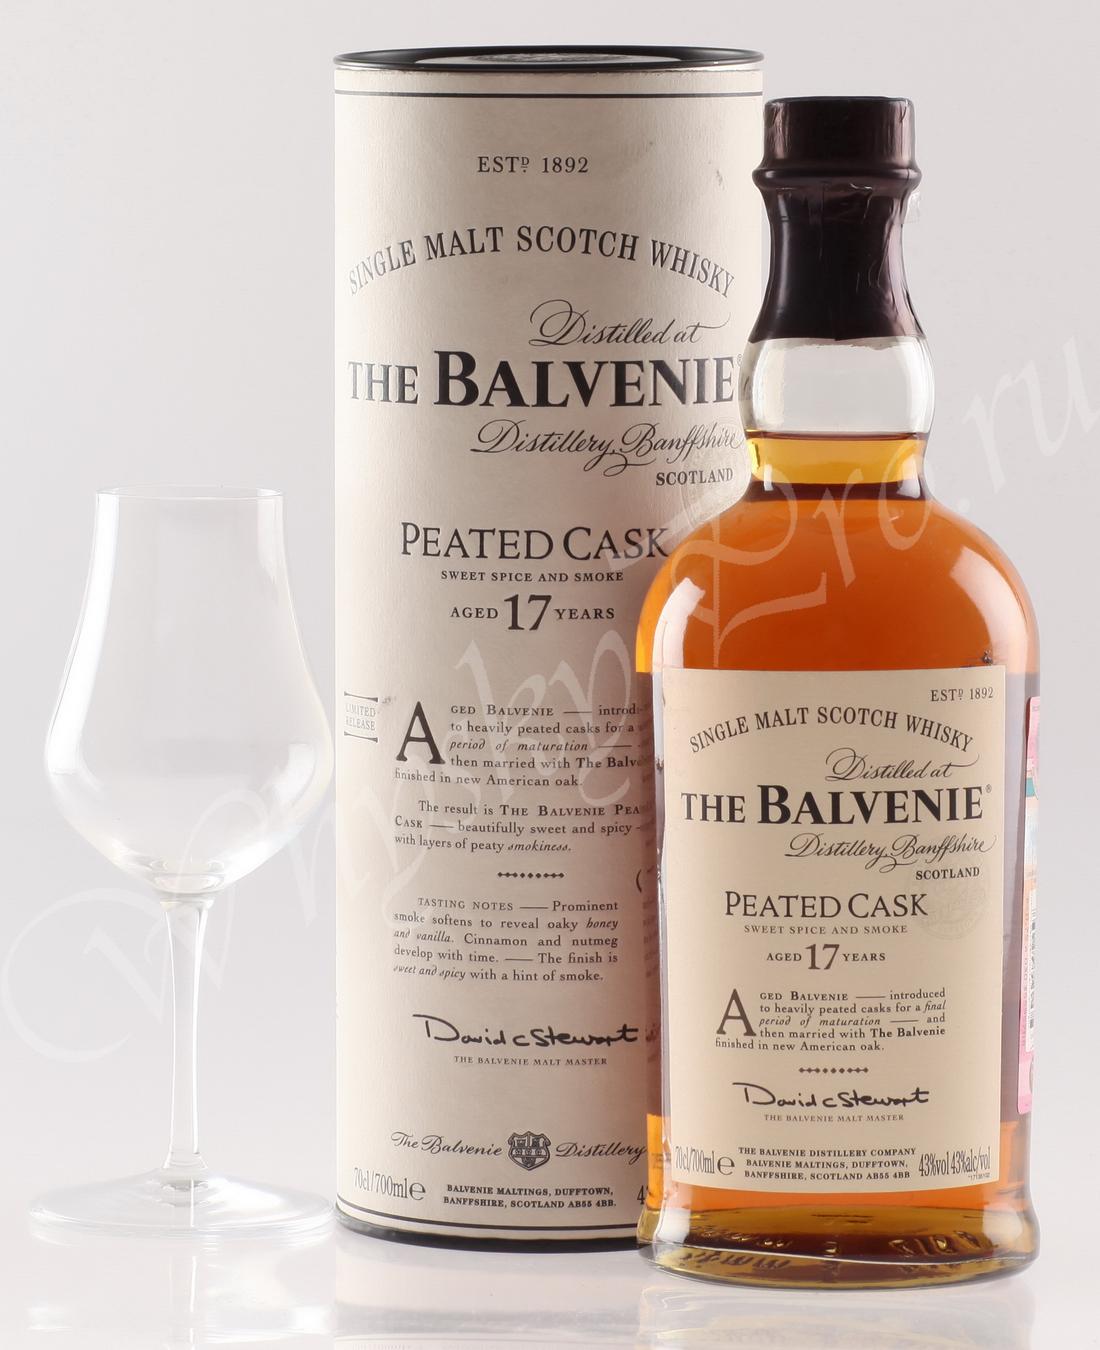 Balvenie 17 years